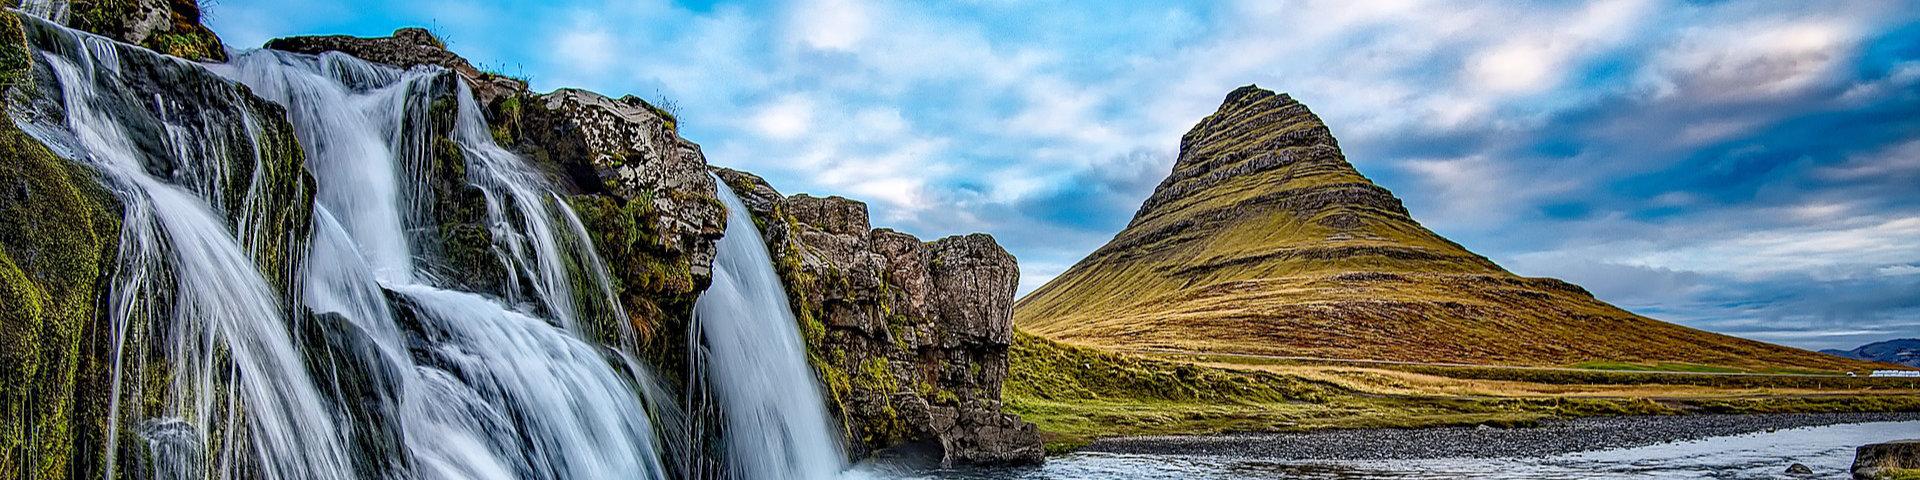 Mt. Kirkjufell in Grundarfjörður Iceland